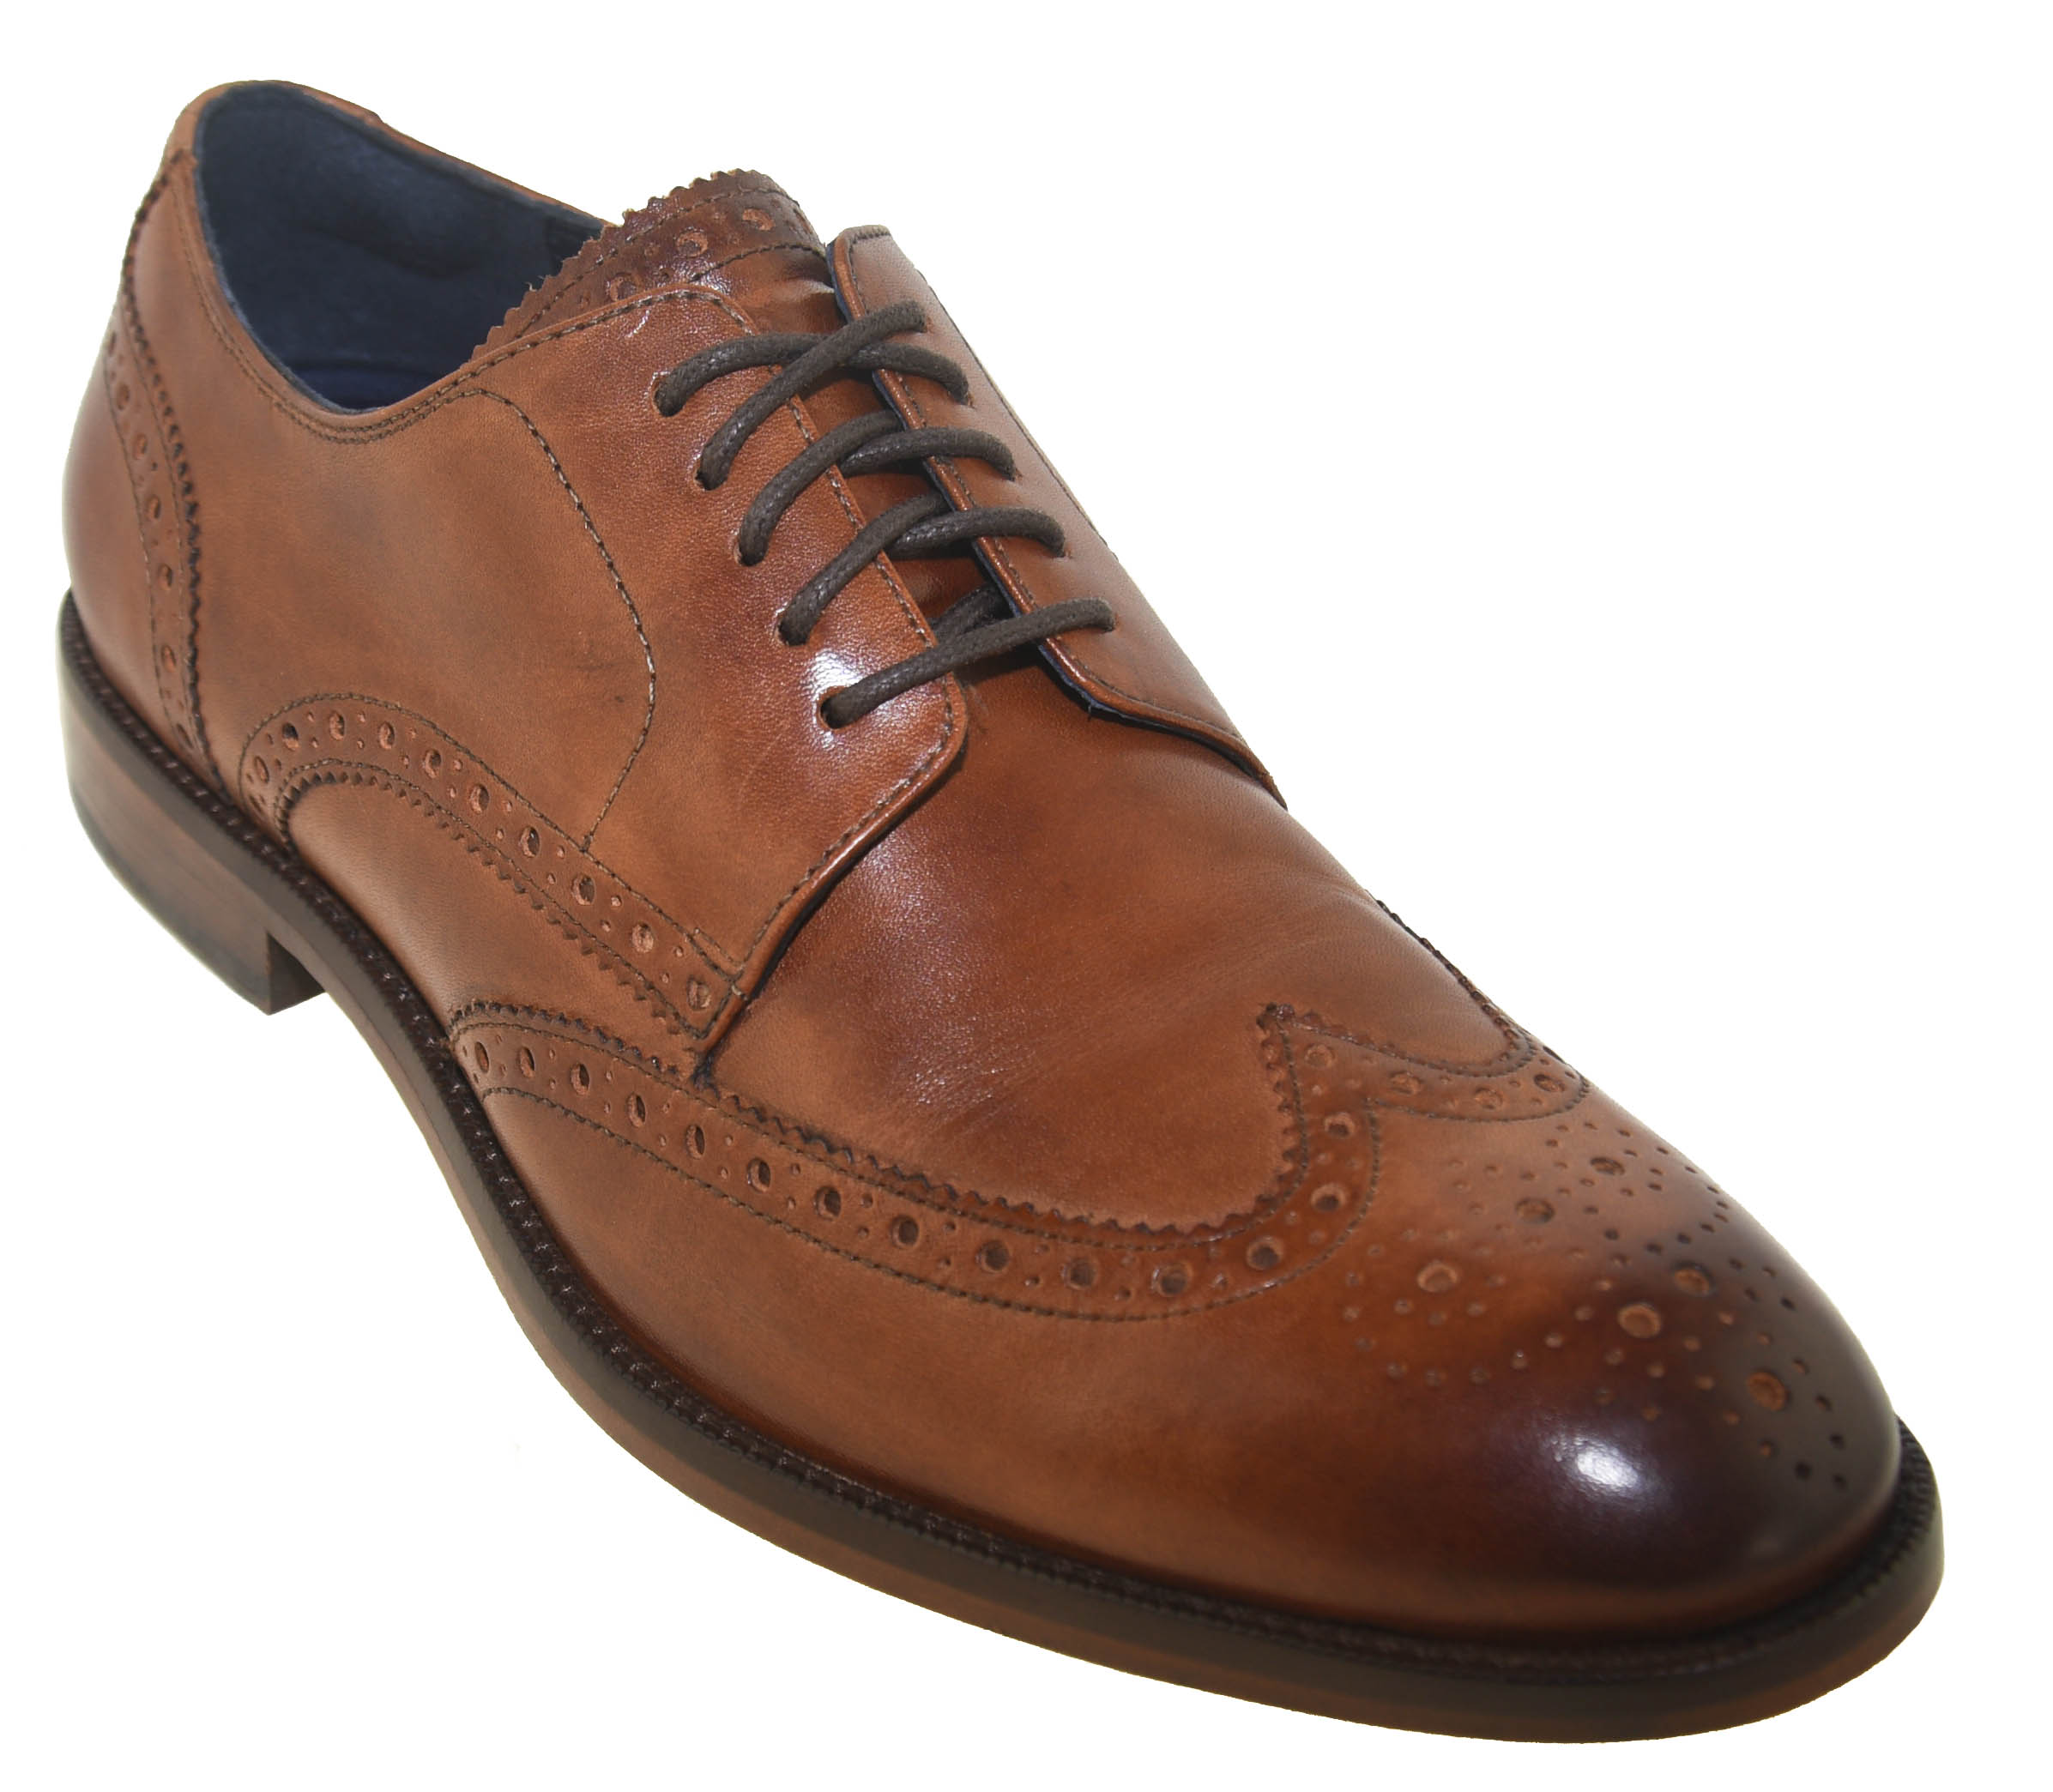 Harrison Wingtip Oxford Brown Style